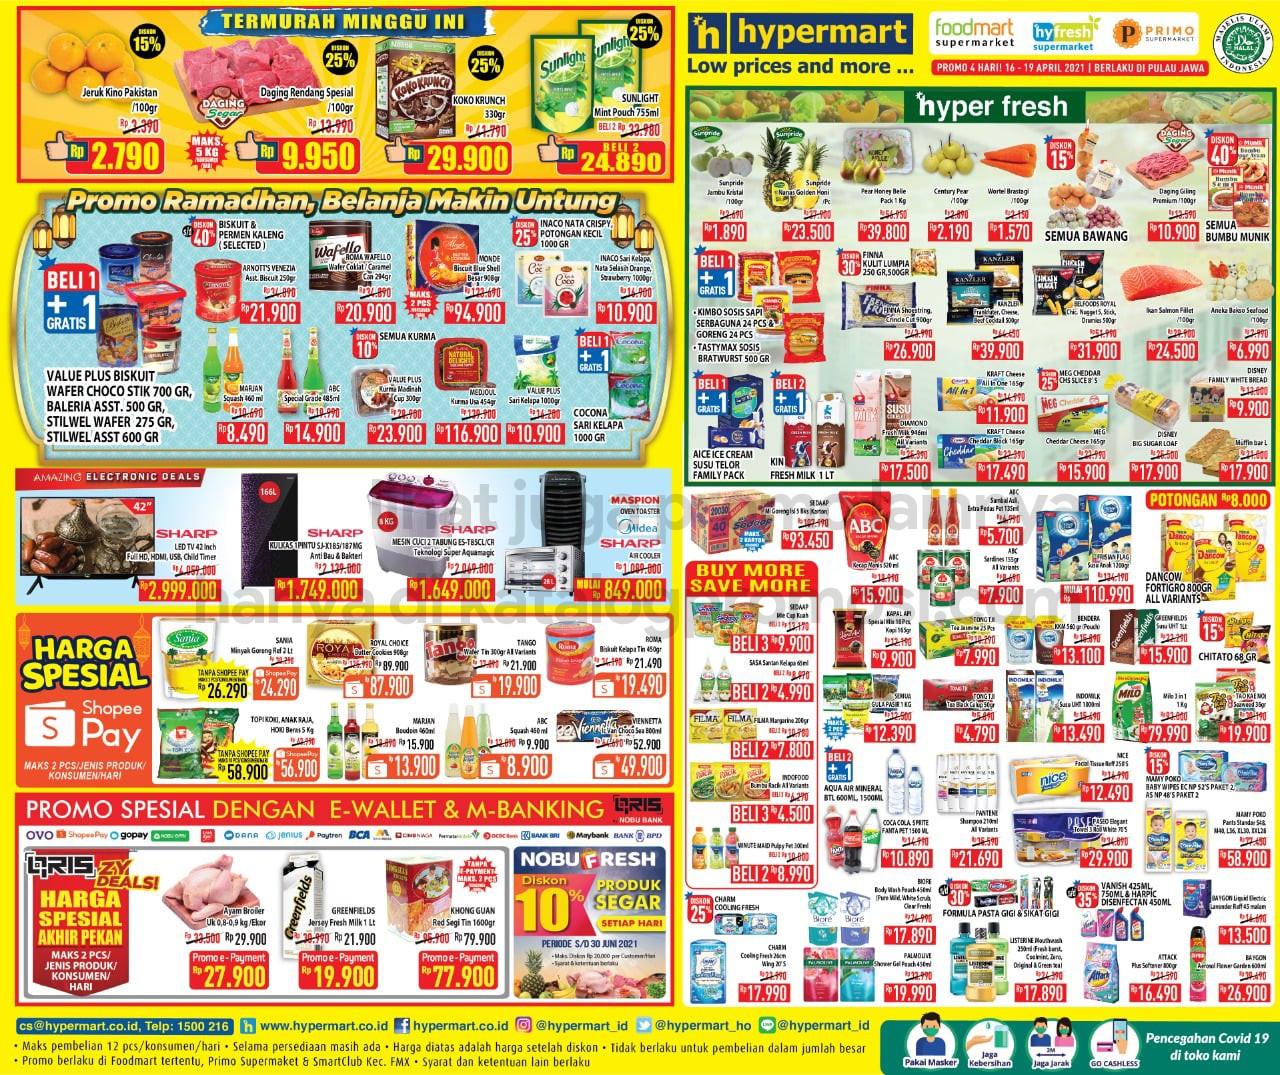 Promo Hypermart JSM Katalog Weekend periode 16-19 April 2021